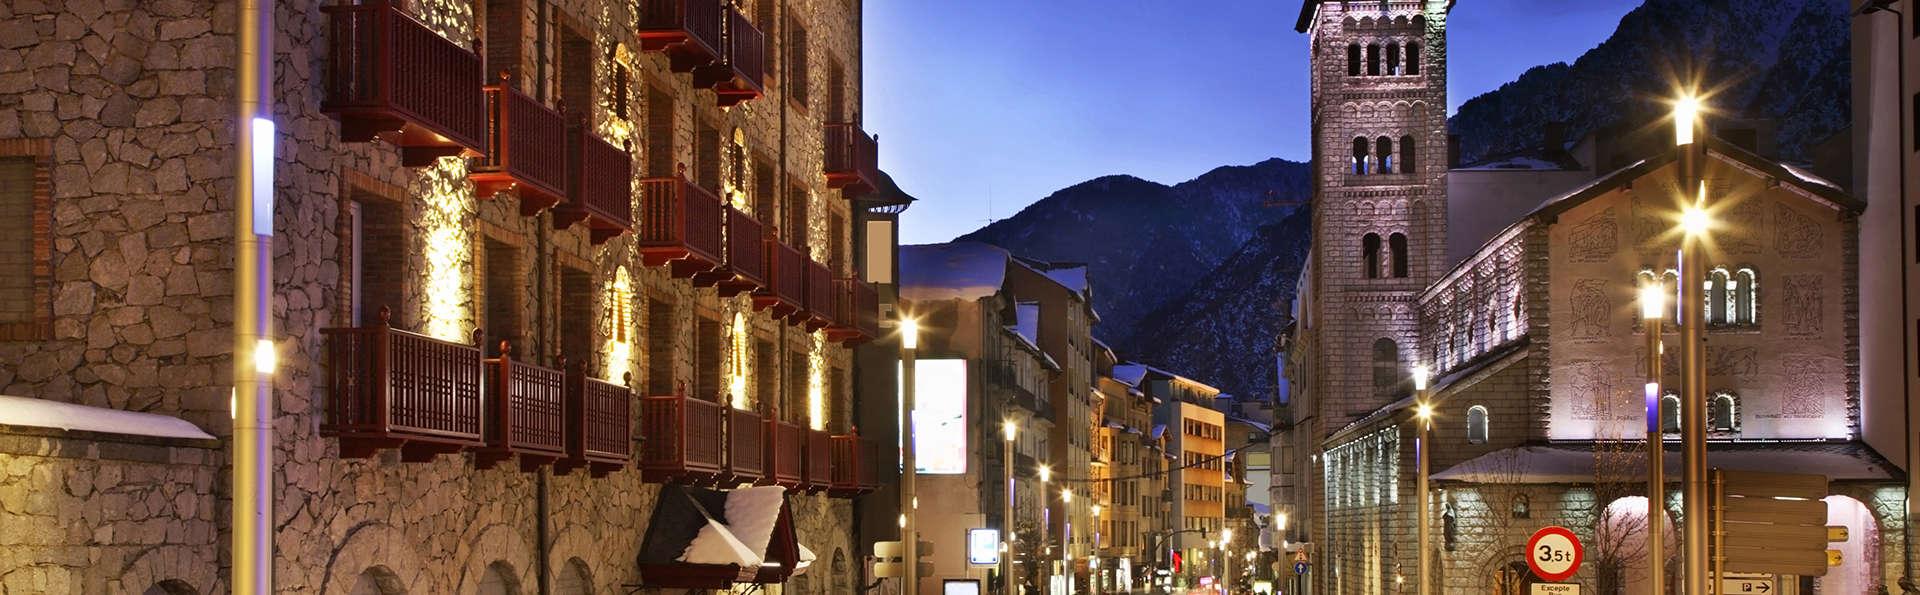 Hotel Àrtic - Edit_AndorralaVella.jpg